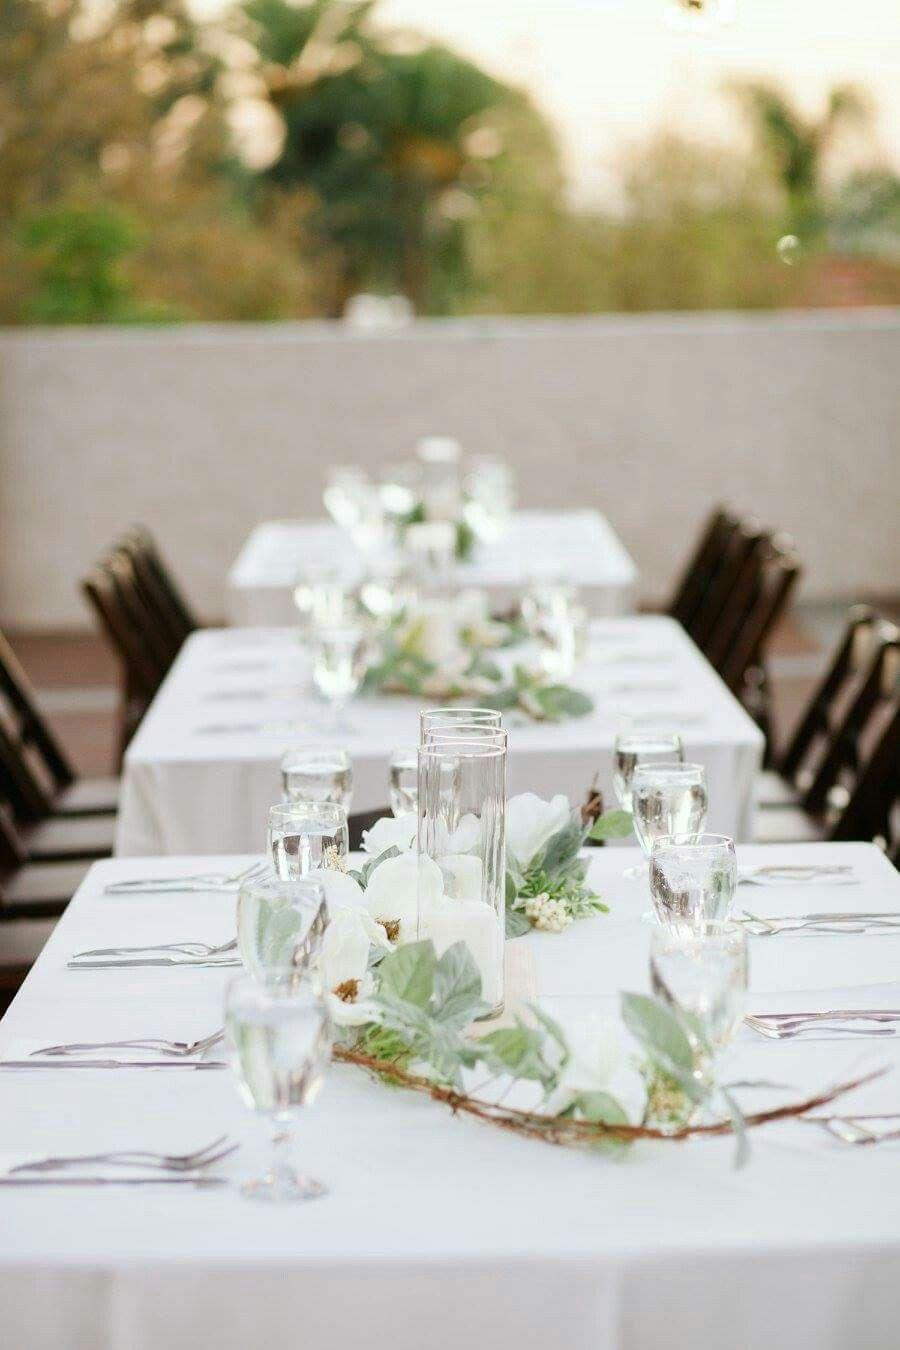 Banquet table decor, outdoor fall evening wedding reception Magnolia ...